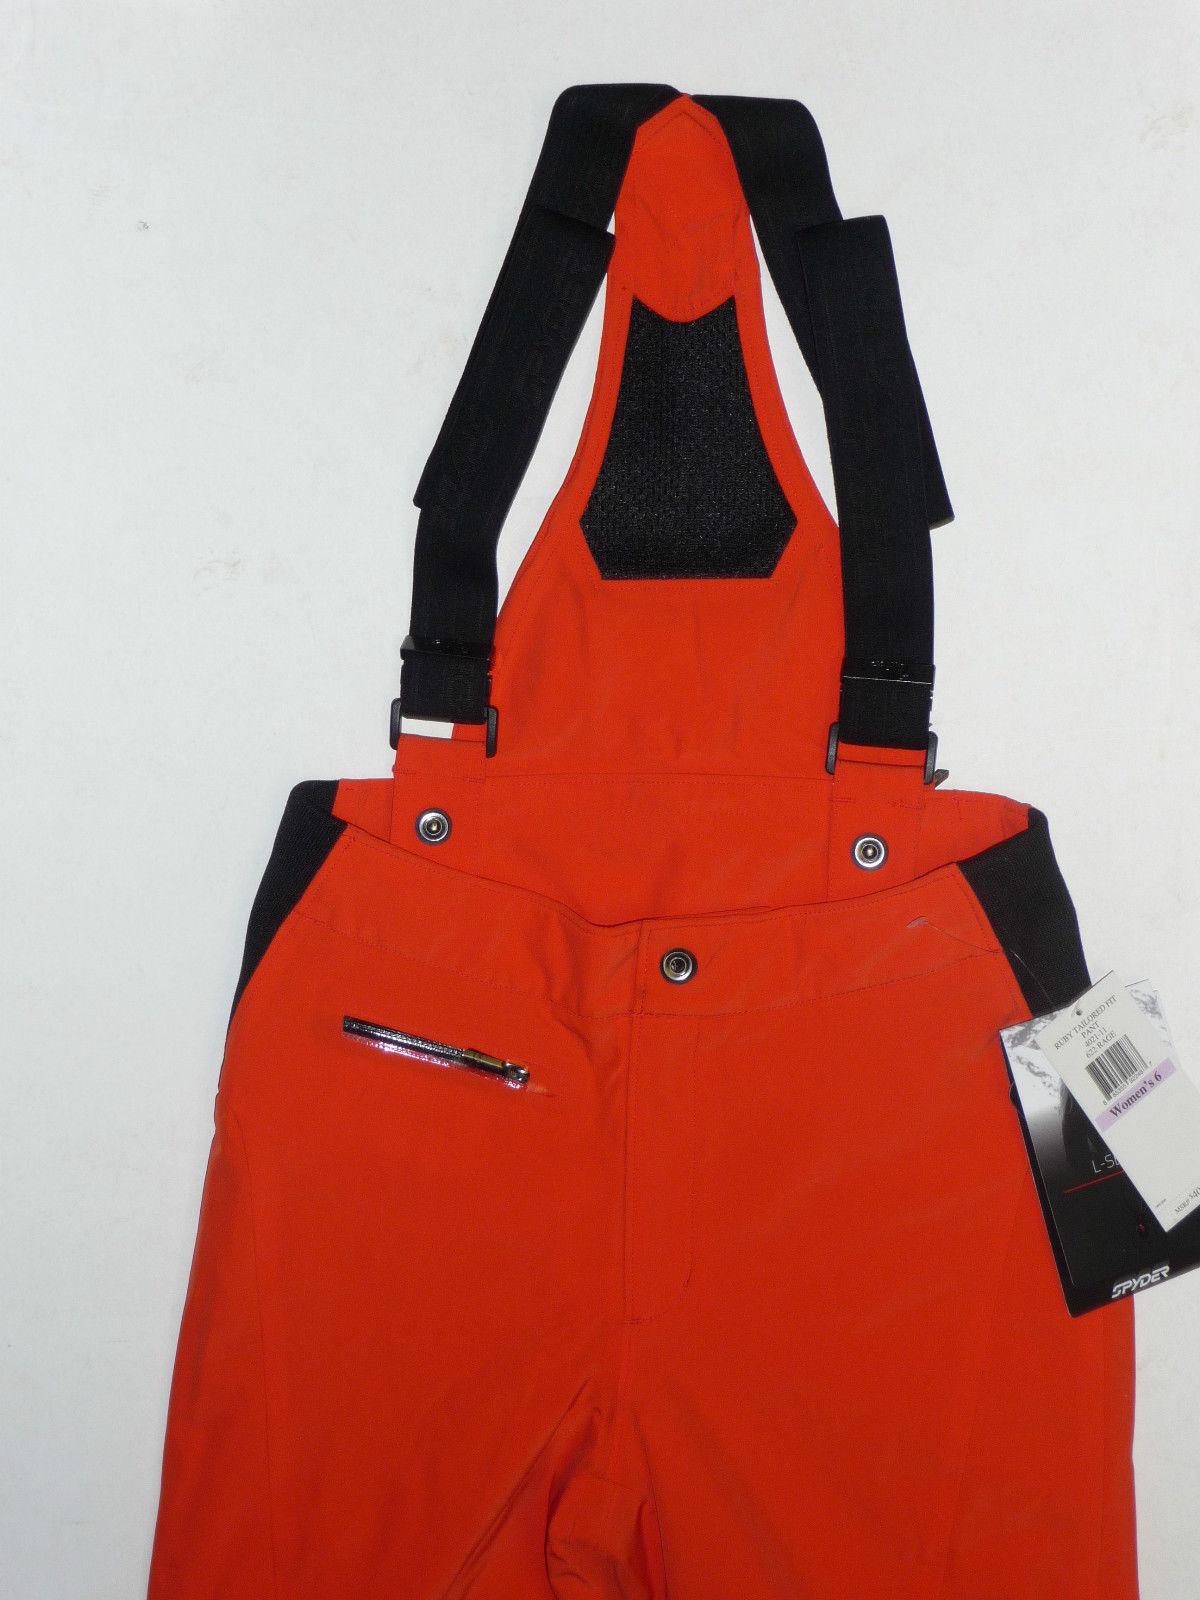 Spyder Ruby Pants Womens Ski Snowboard 20k Waterproof Insulated Orange 6 $400 image 2